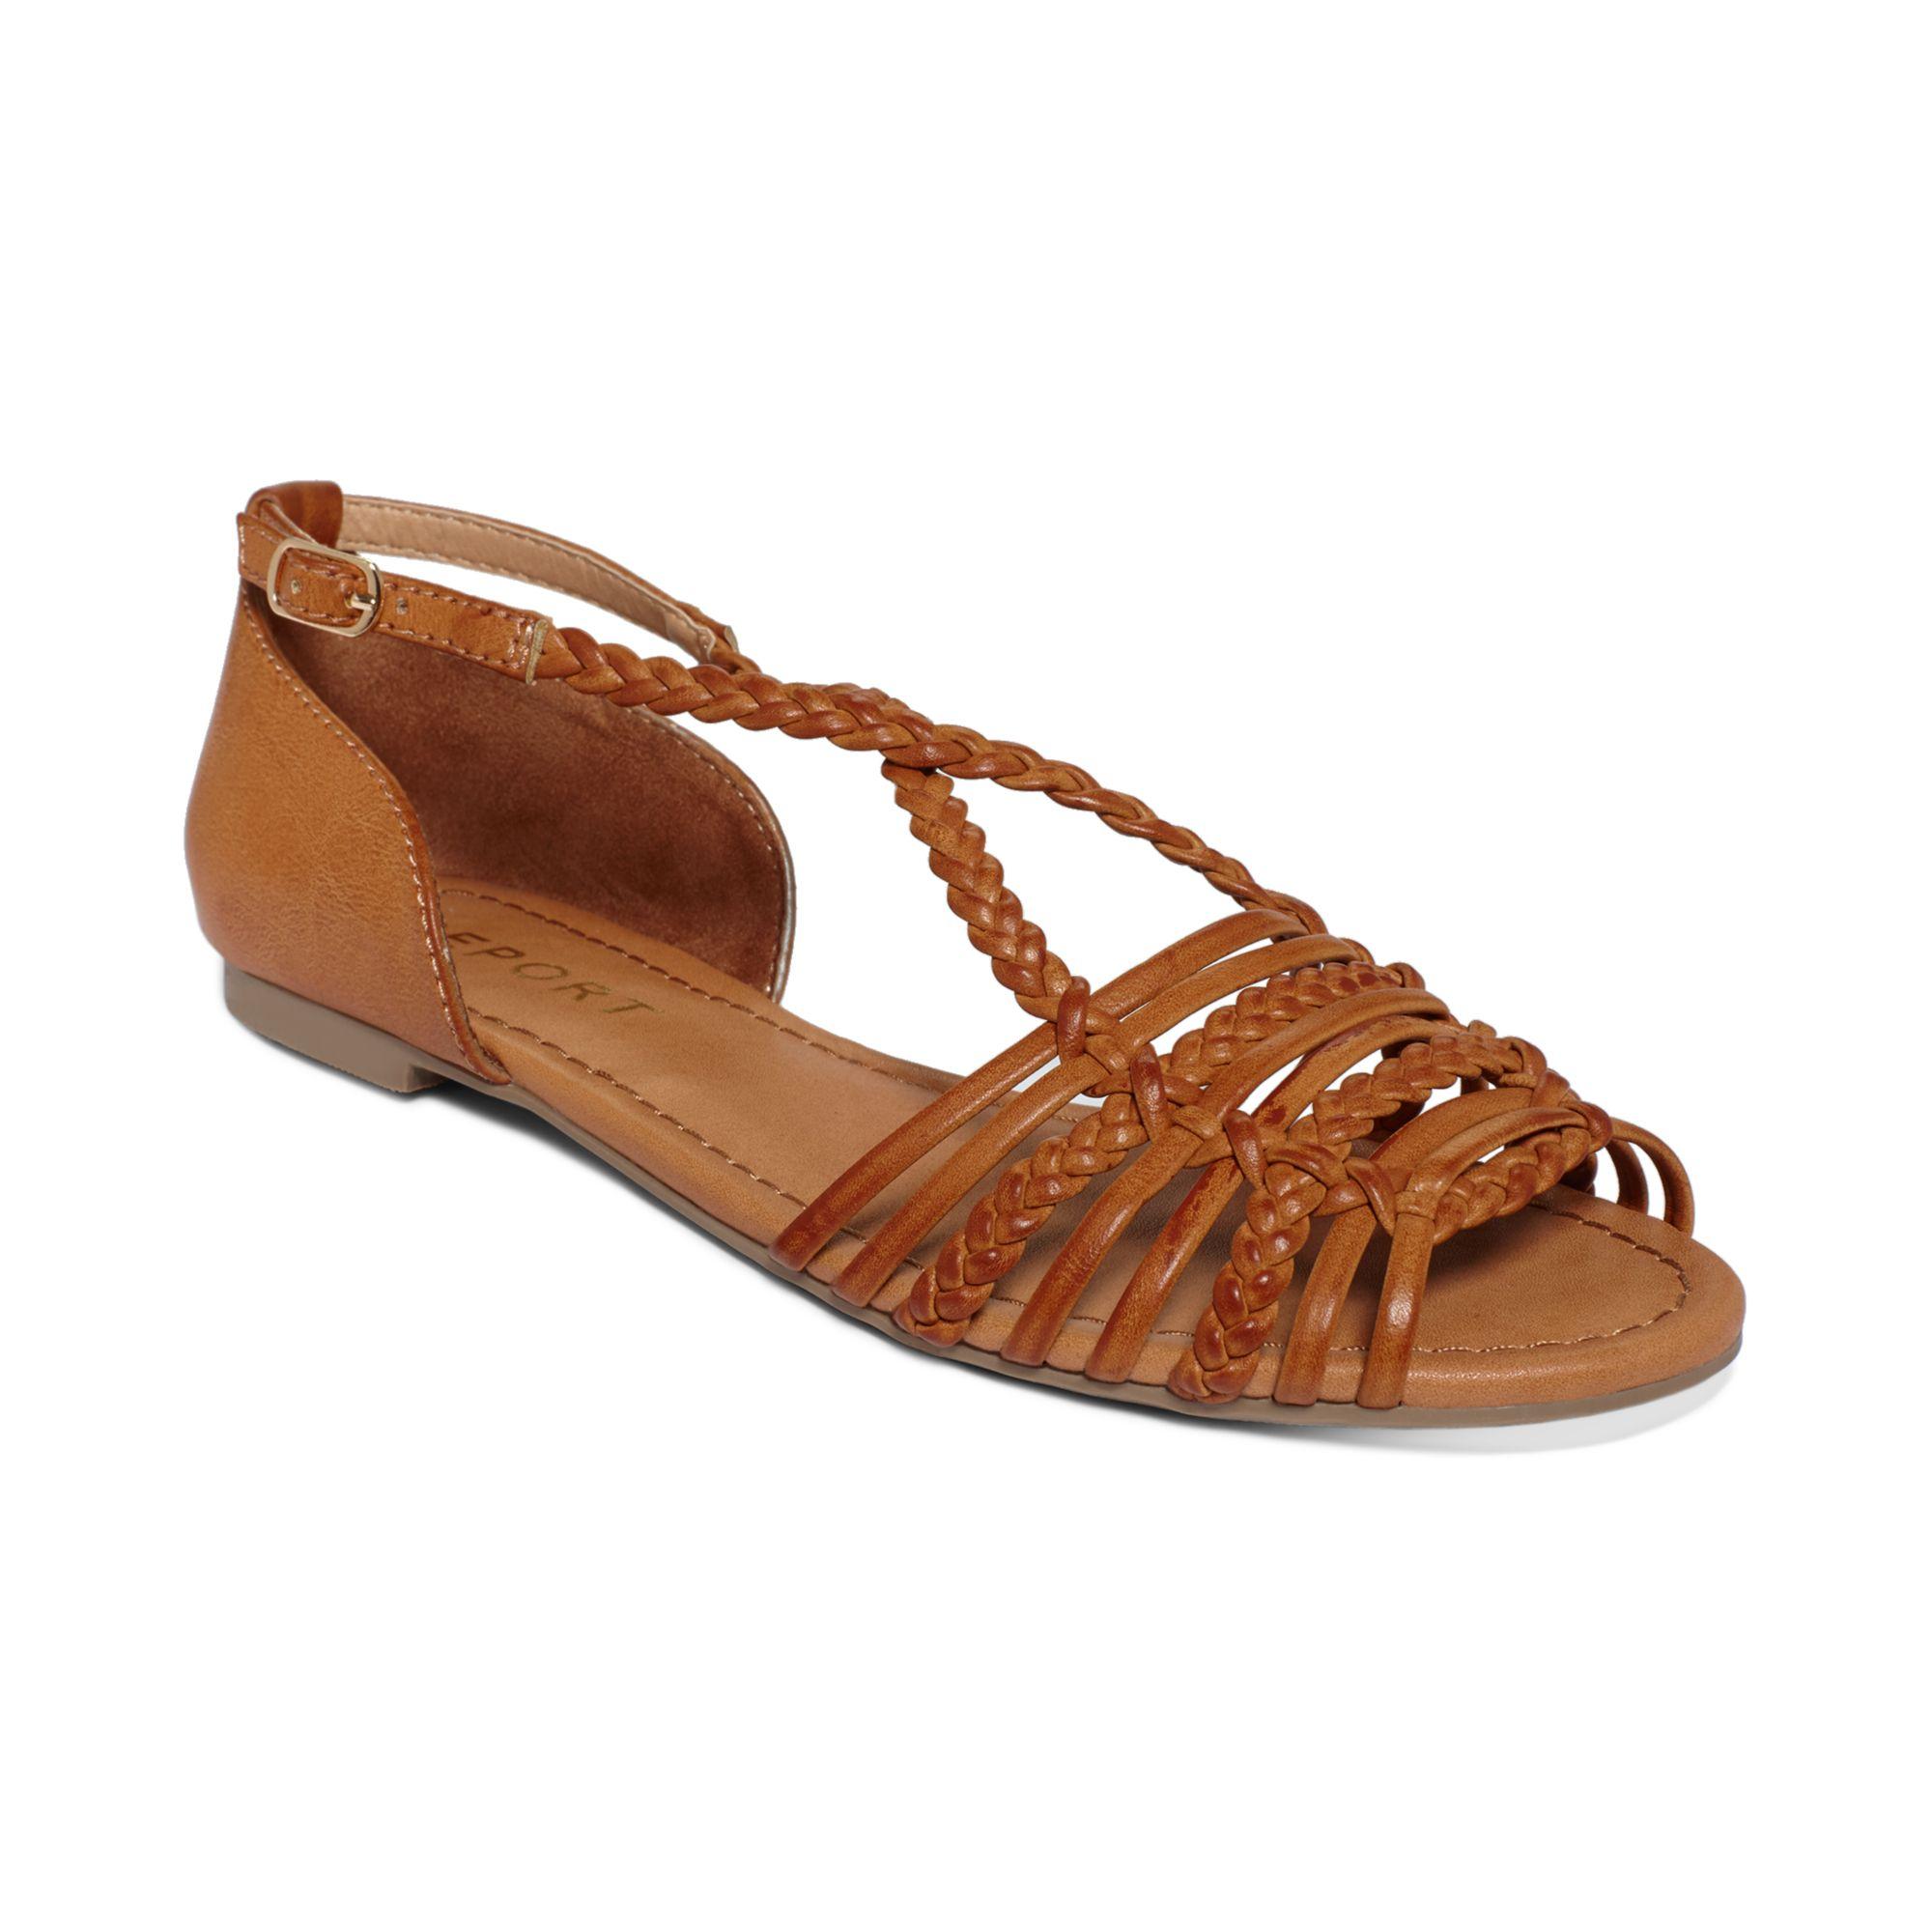 lyst report cristina flat sandals in brown. Black Bedroom Furniture Sets. Home Design Ideas